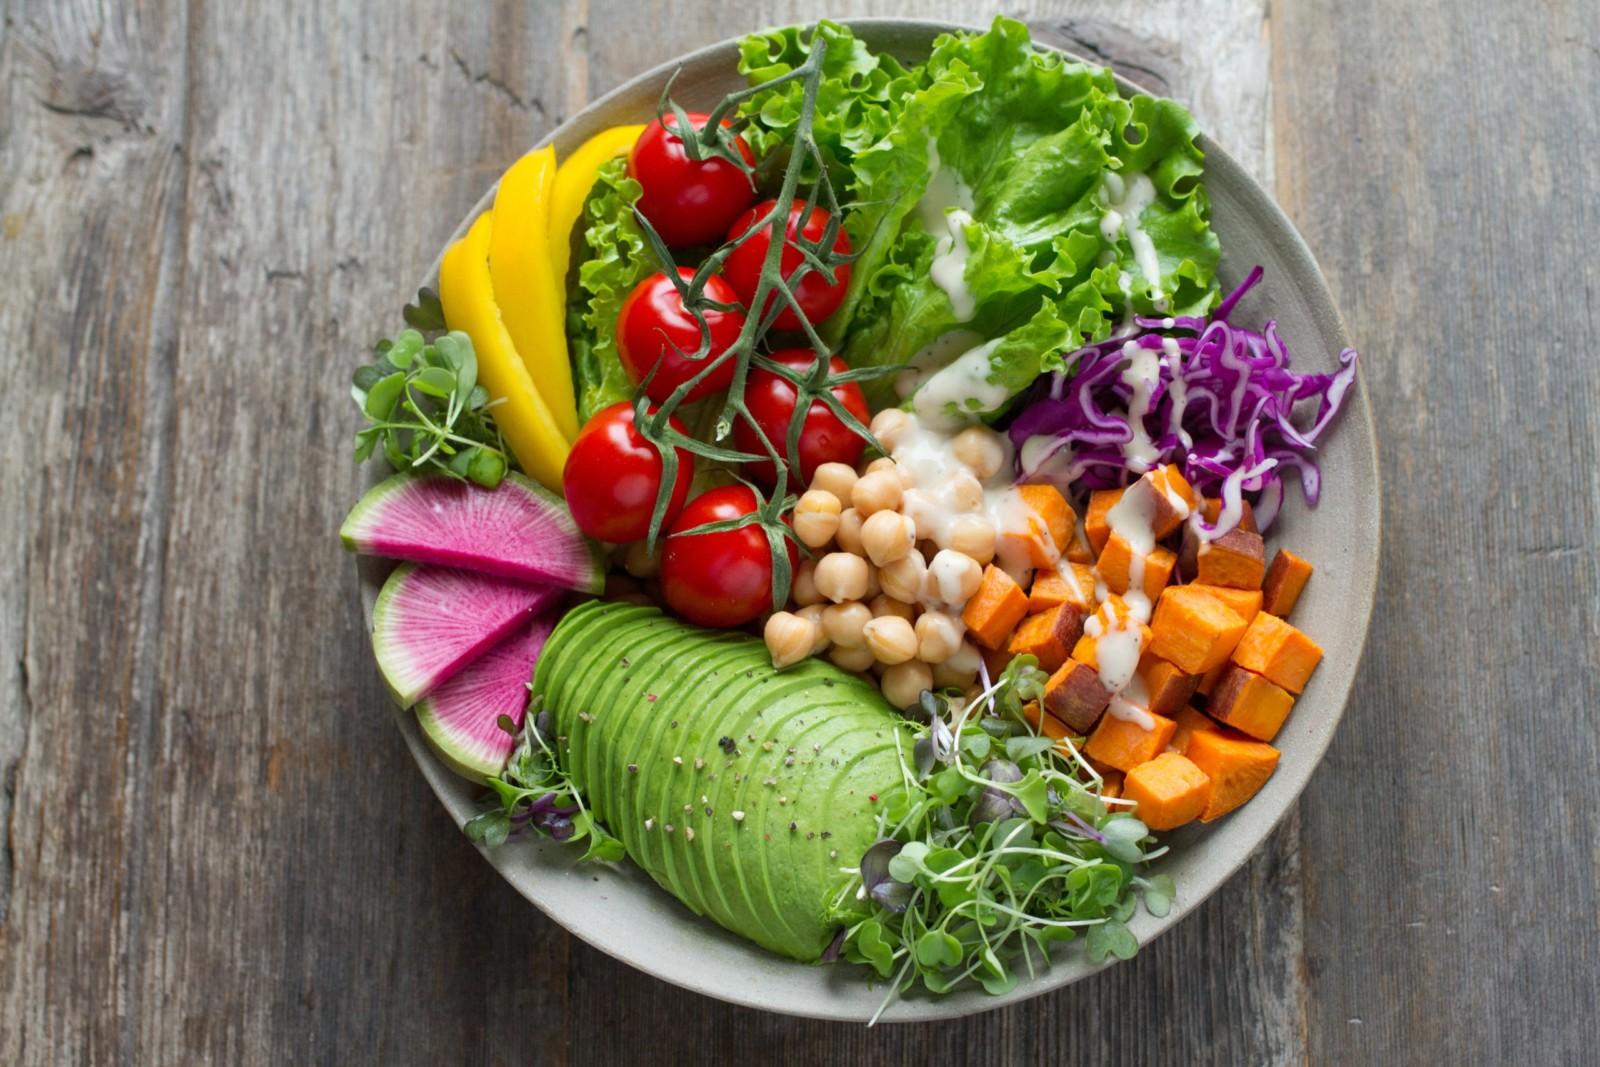 Farm fresh salad sourced from Driggs Farmers Market